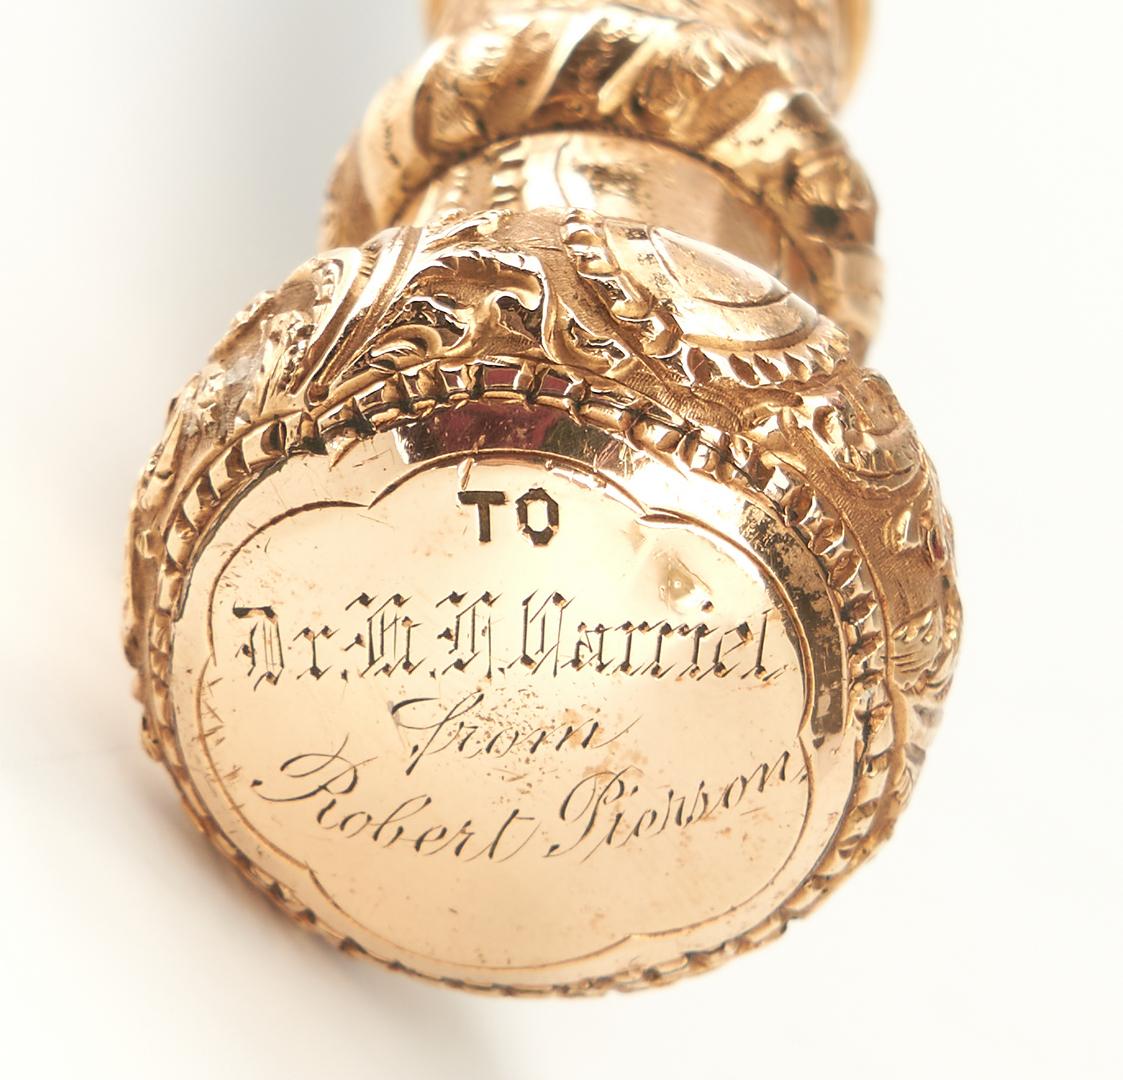 Lot 436: Elgin Pocket Watch & 3 Canes, incl. 14K Gold